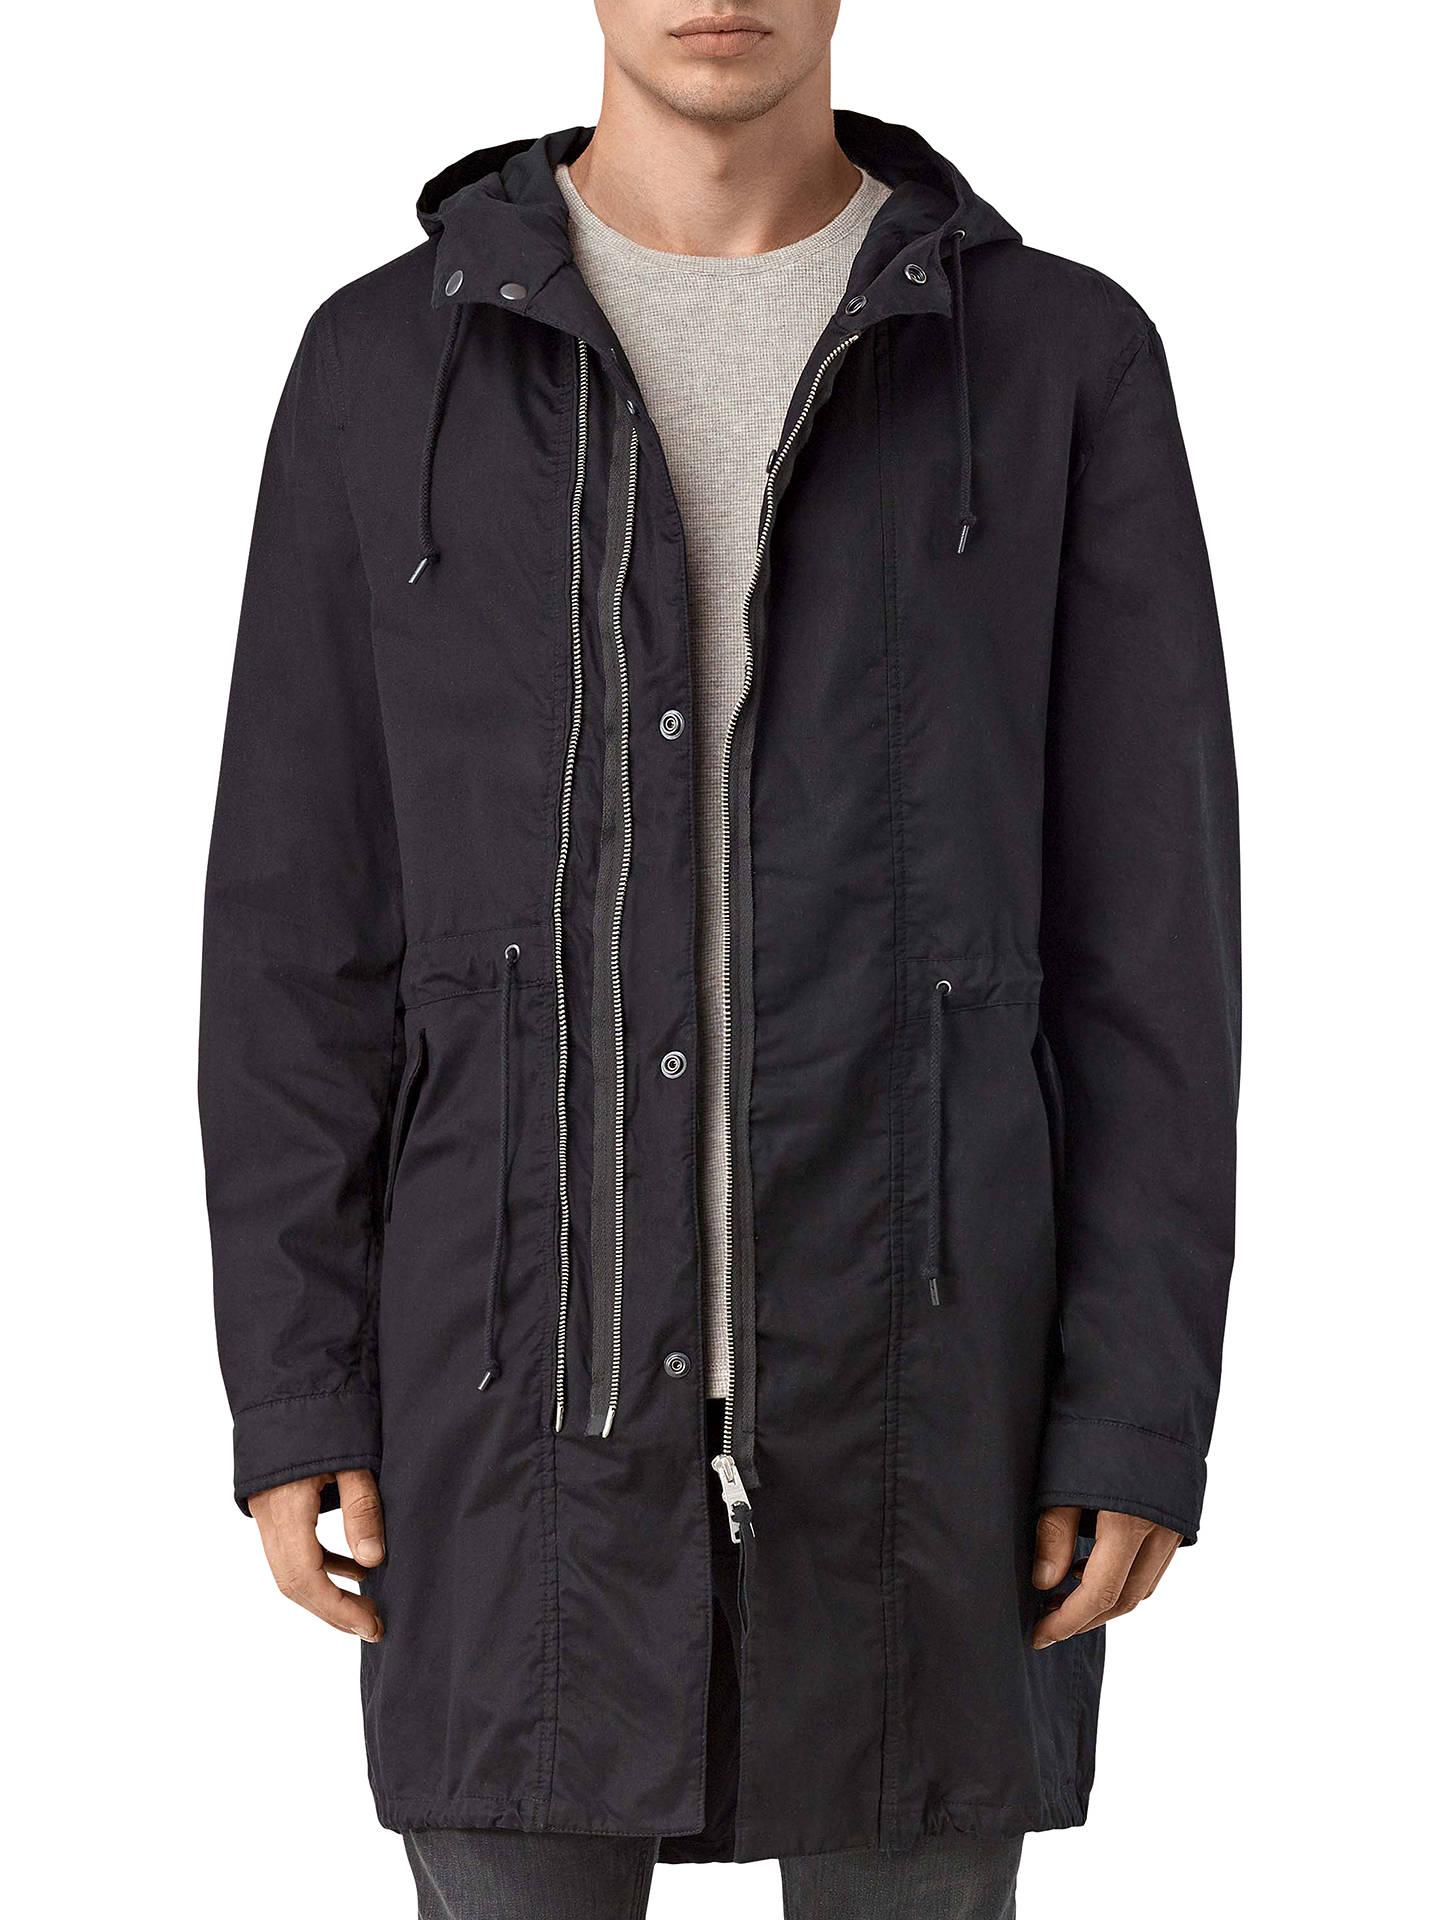 7d0c84c4c88 AllSaints Geo Parka Coat, Black at John Lewis & Partners